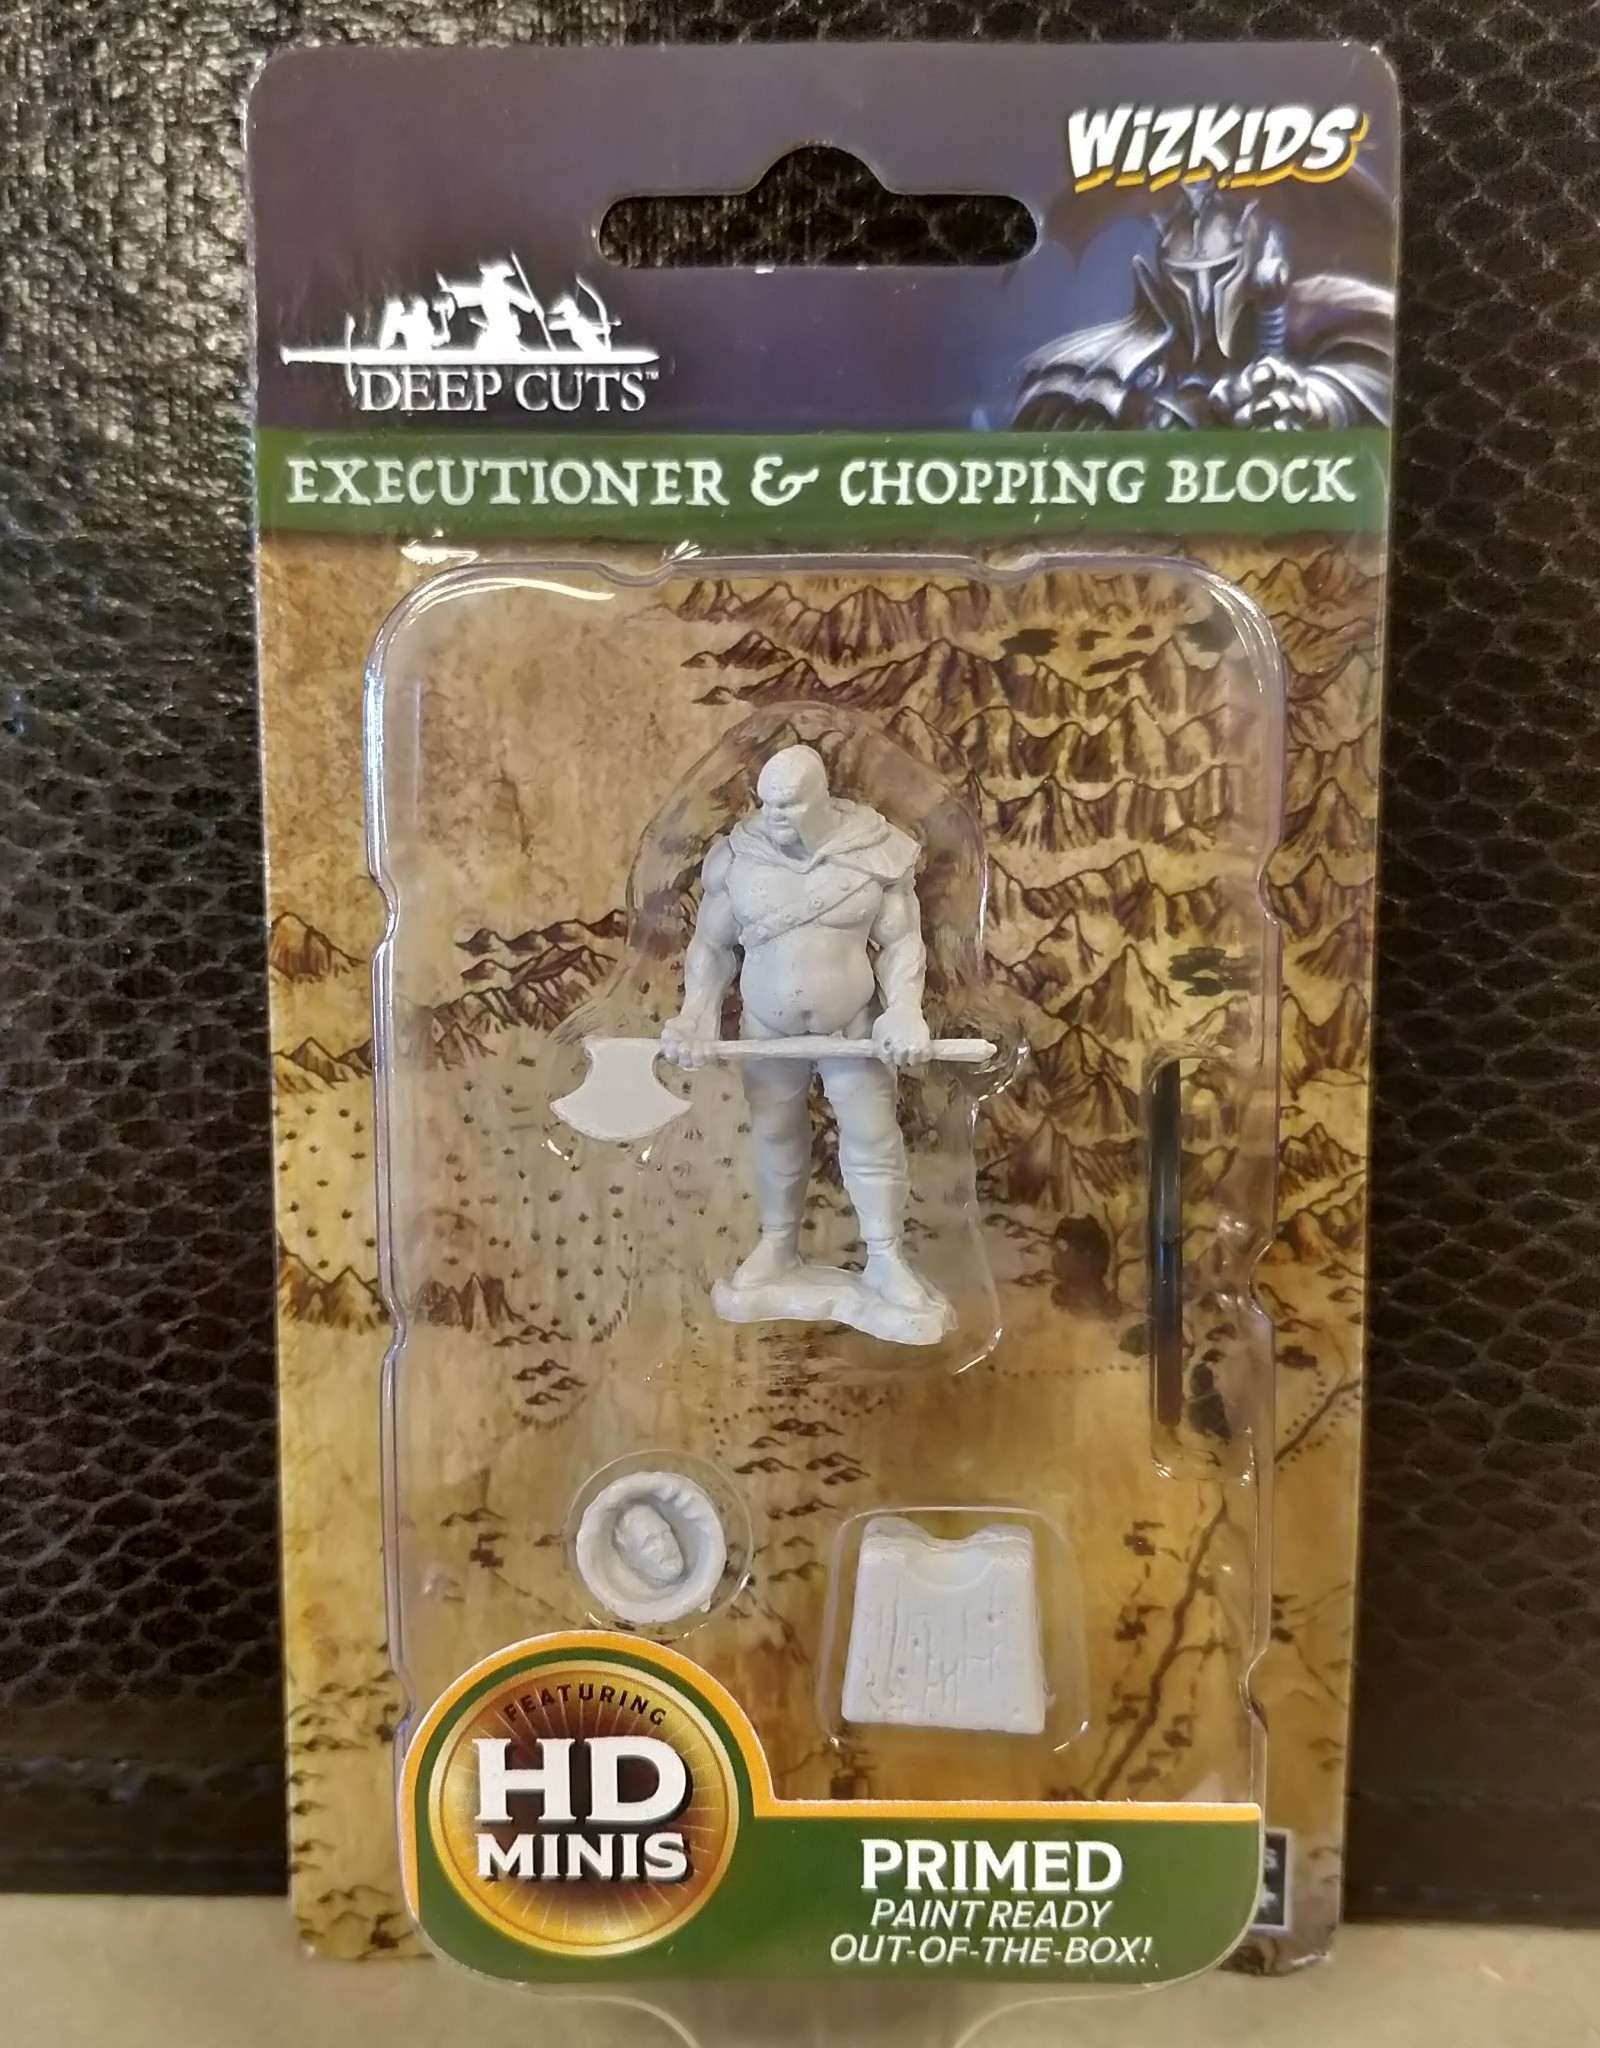 WizKids Deep Cuts Unpainted Miniatures: W6 Executioner & Chopping Block